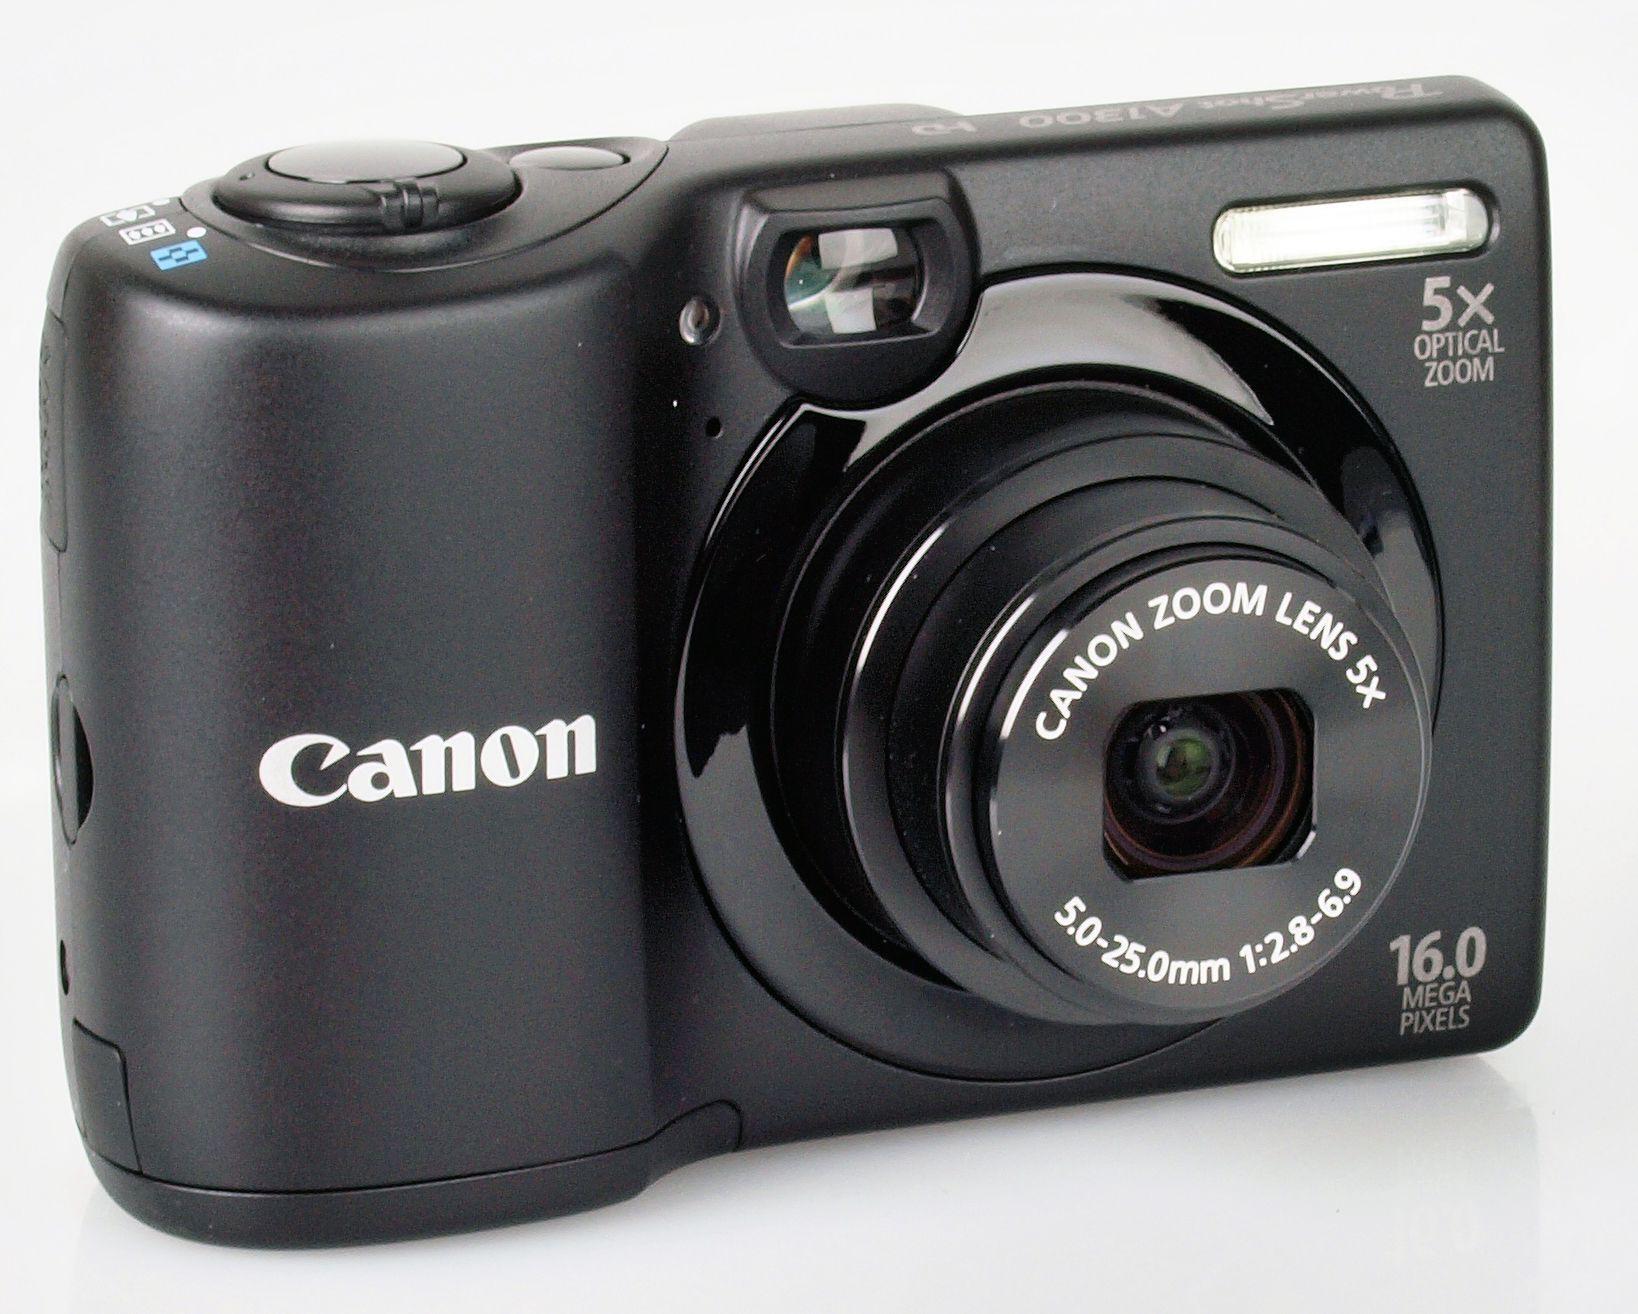 Canon Digital Camera Reviews | Canon PowerShot A1300 Digital ...